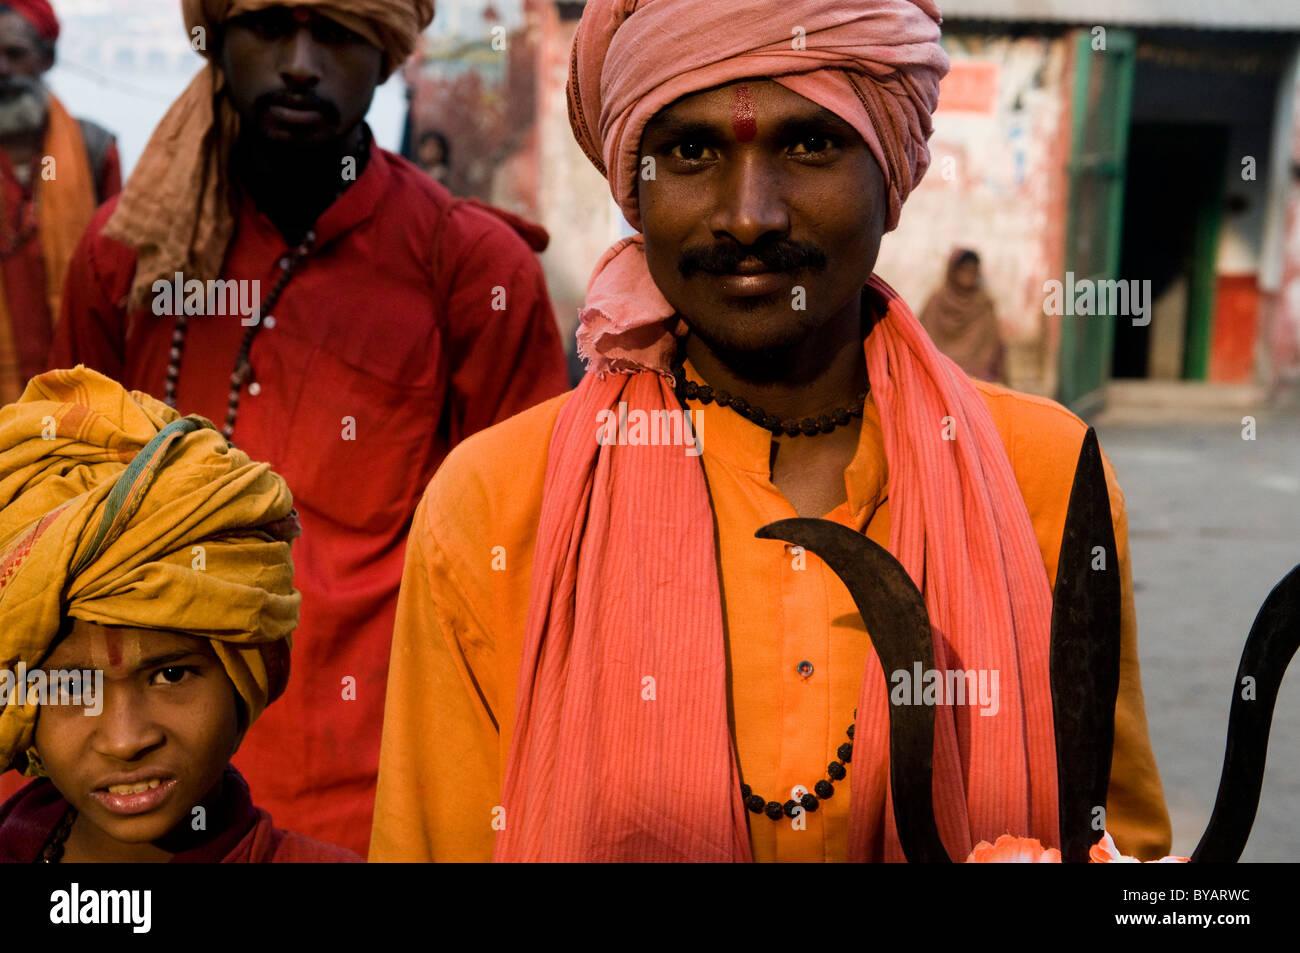 Colorful Indian sadhus. - Stock Image